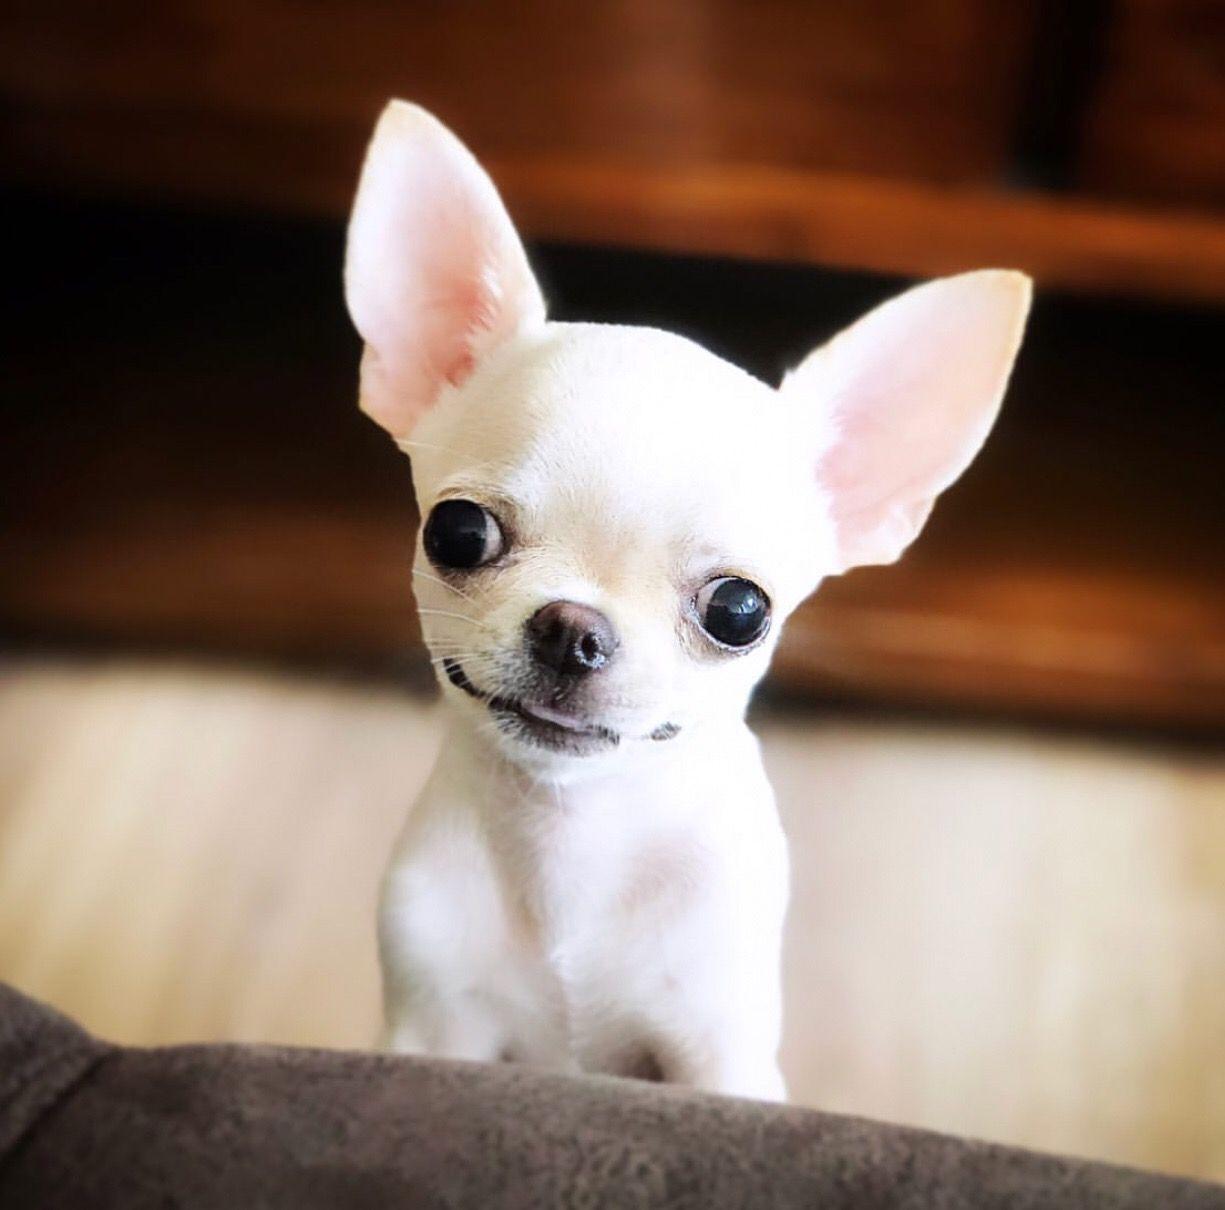 Pin By Jill Jurcago On Chihuahua Chihuahua Dogs Cute Animals